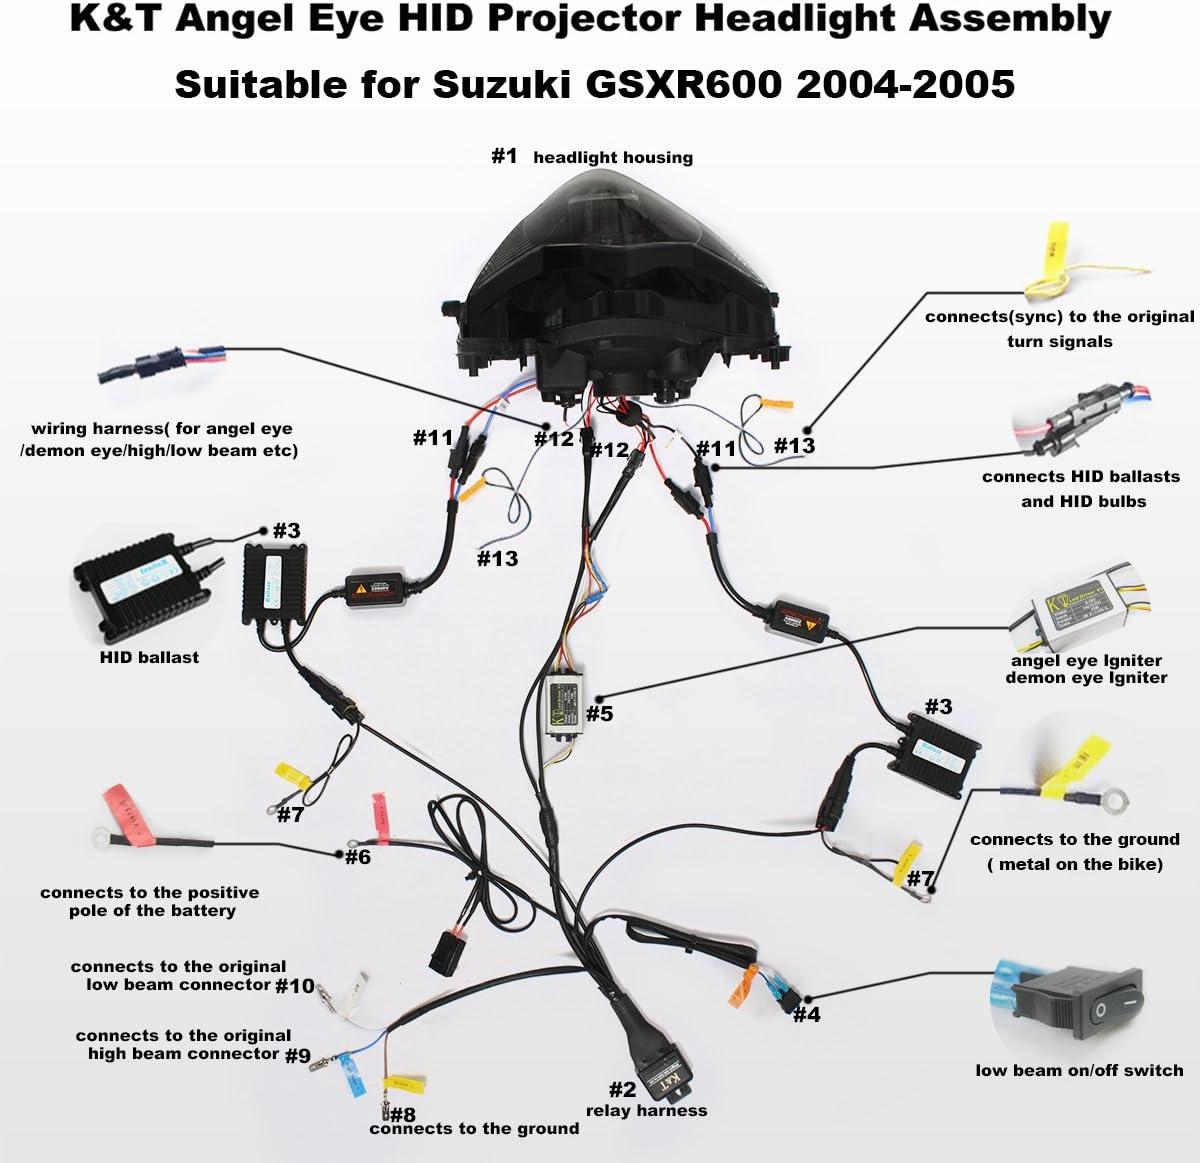 Amazon.com: KT LED Angel Eye Headlight Assembly for Suzuki GSXR600 GSX-R600  2004-2005 Red Demon Eye: Automotive [ 1165 x 1200 Pixel ]